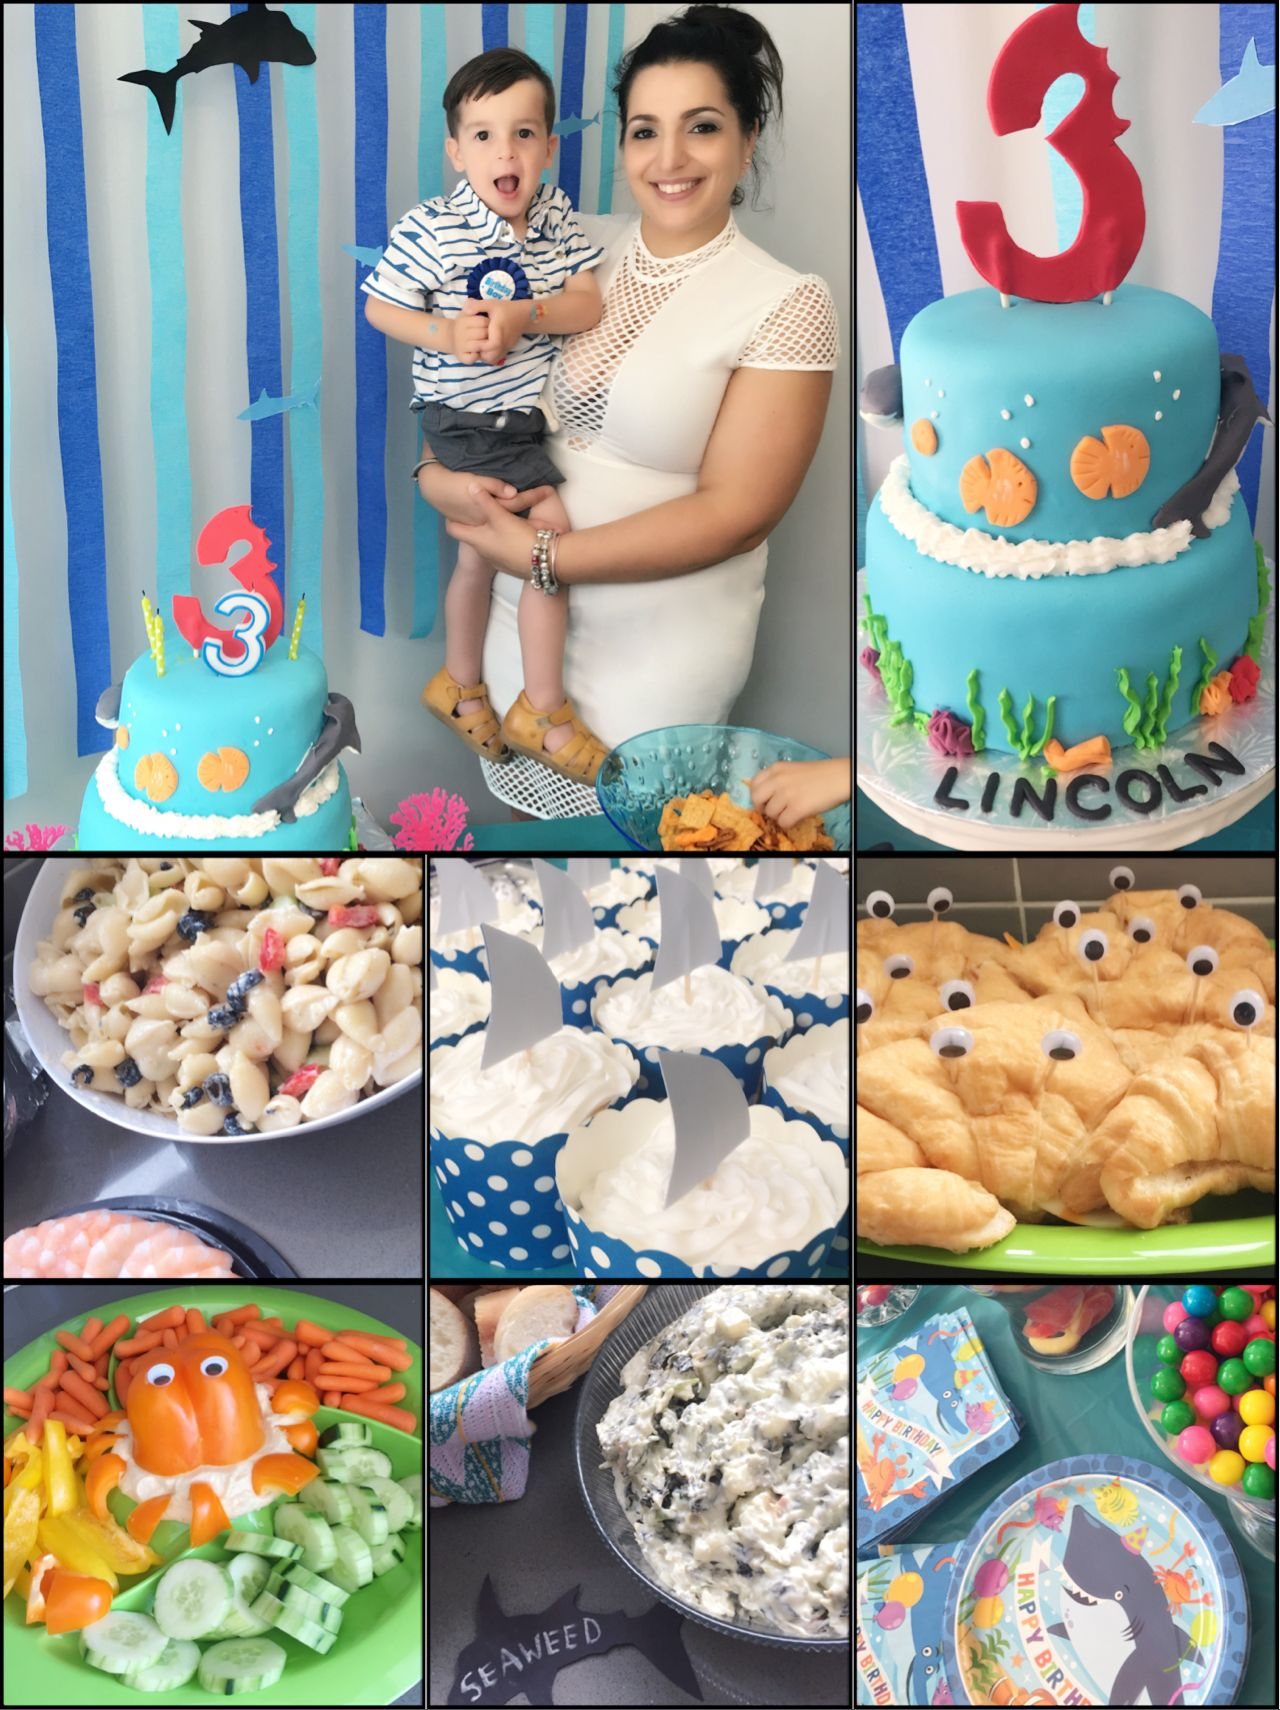 Under The Sea Shark Party Ideas Seashell Pasta Seaweed Dip Fin Cupcakes Crab Sandwiches Octopus Theme Toddler Boy Birthday